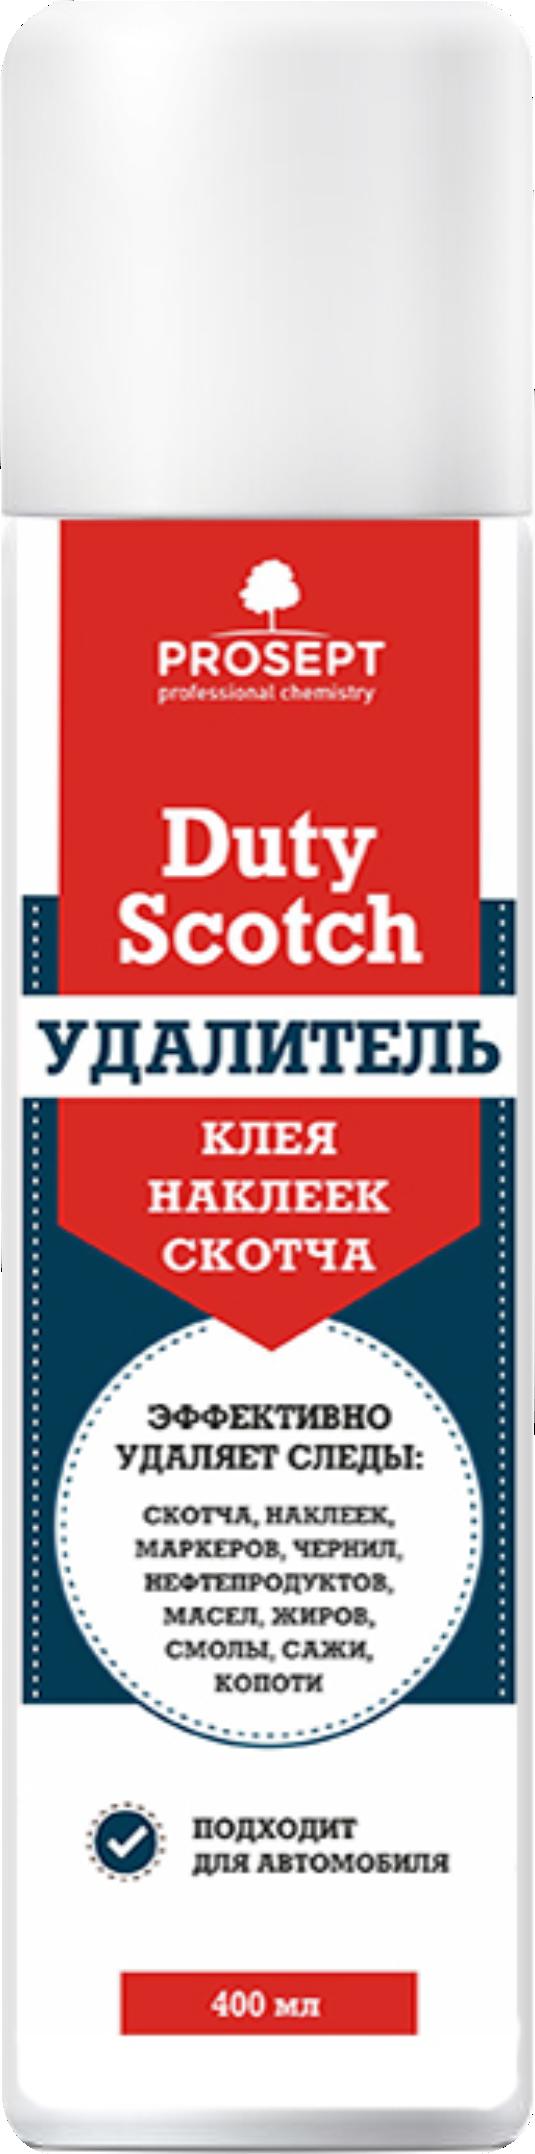 DUTY SCOTCH средство для удаления клея, скотча 0,4л